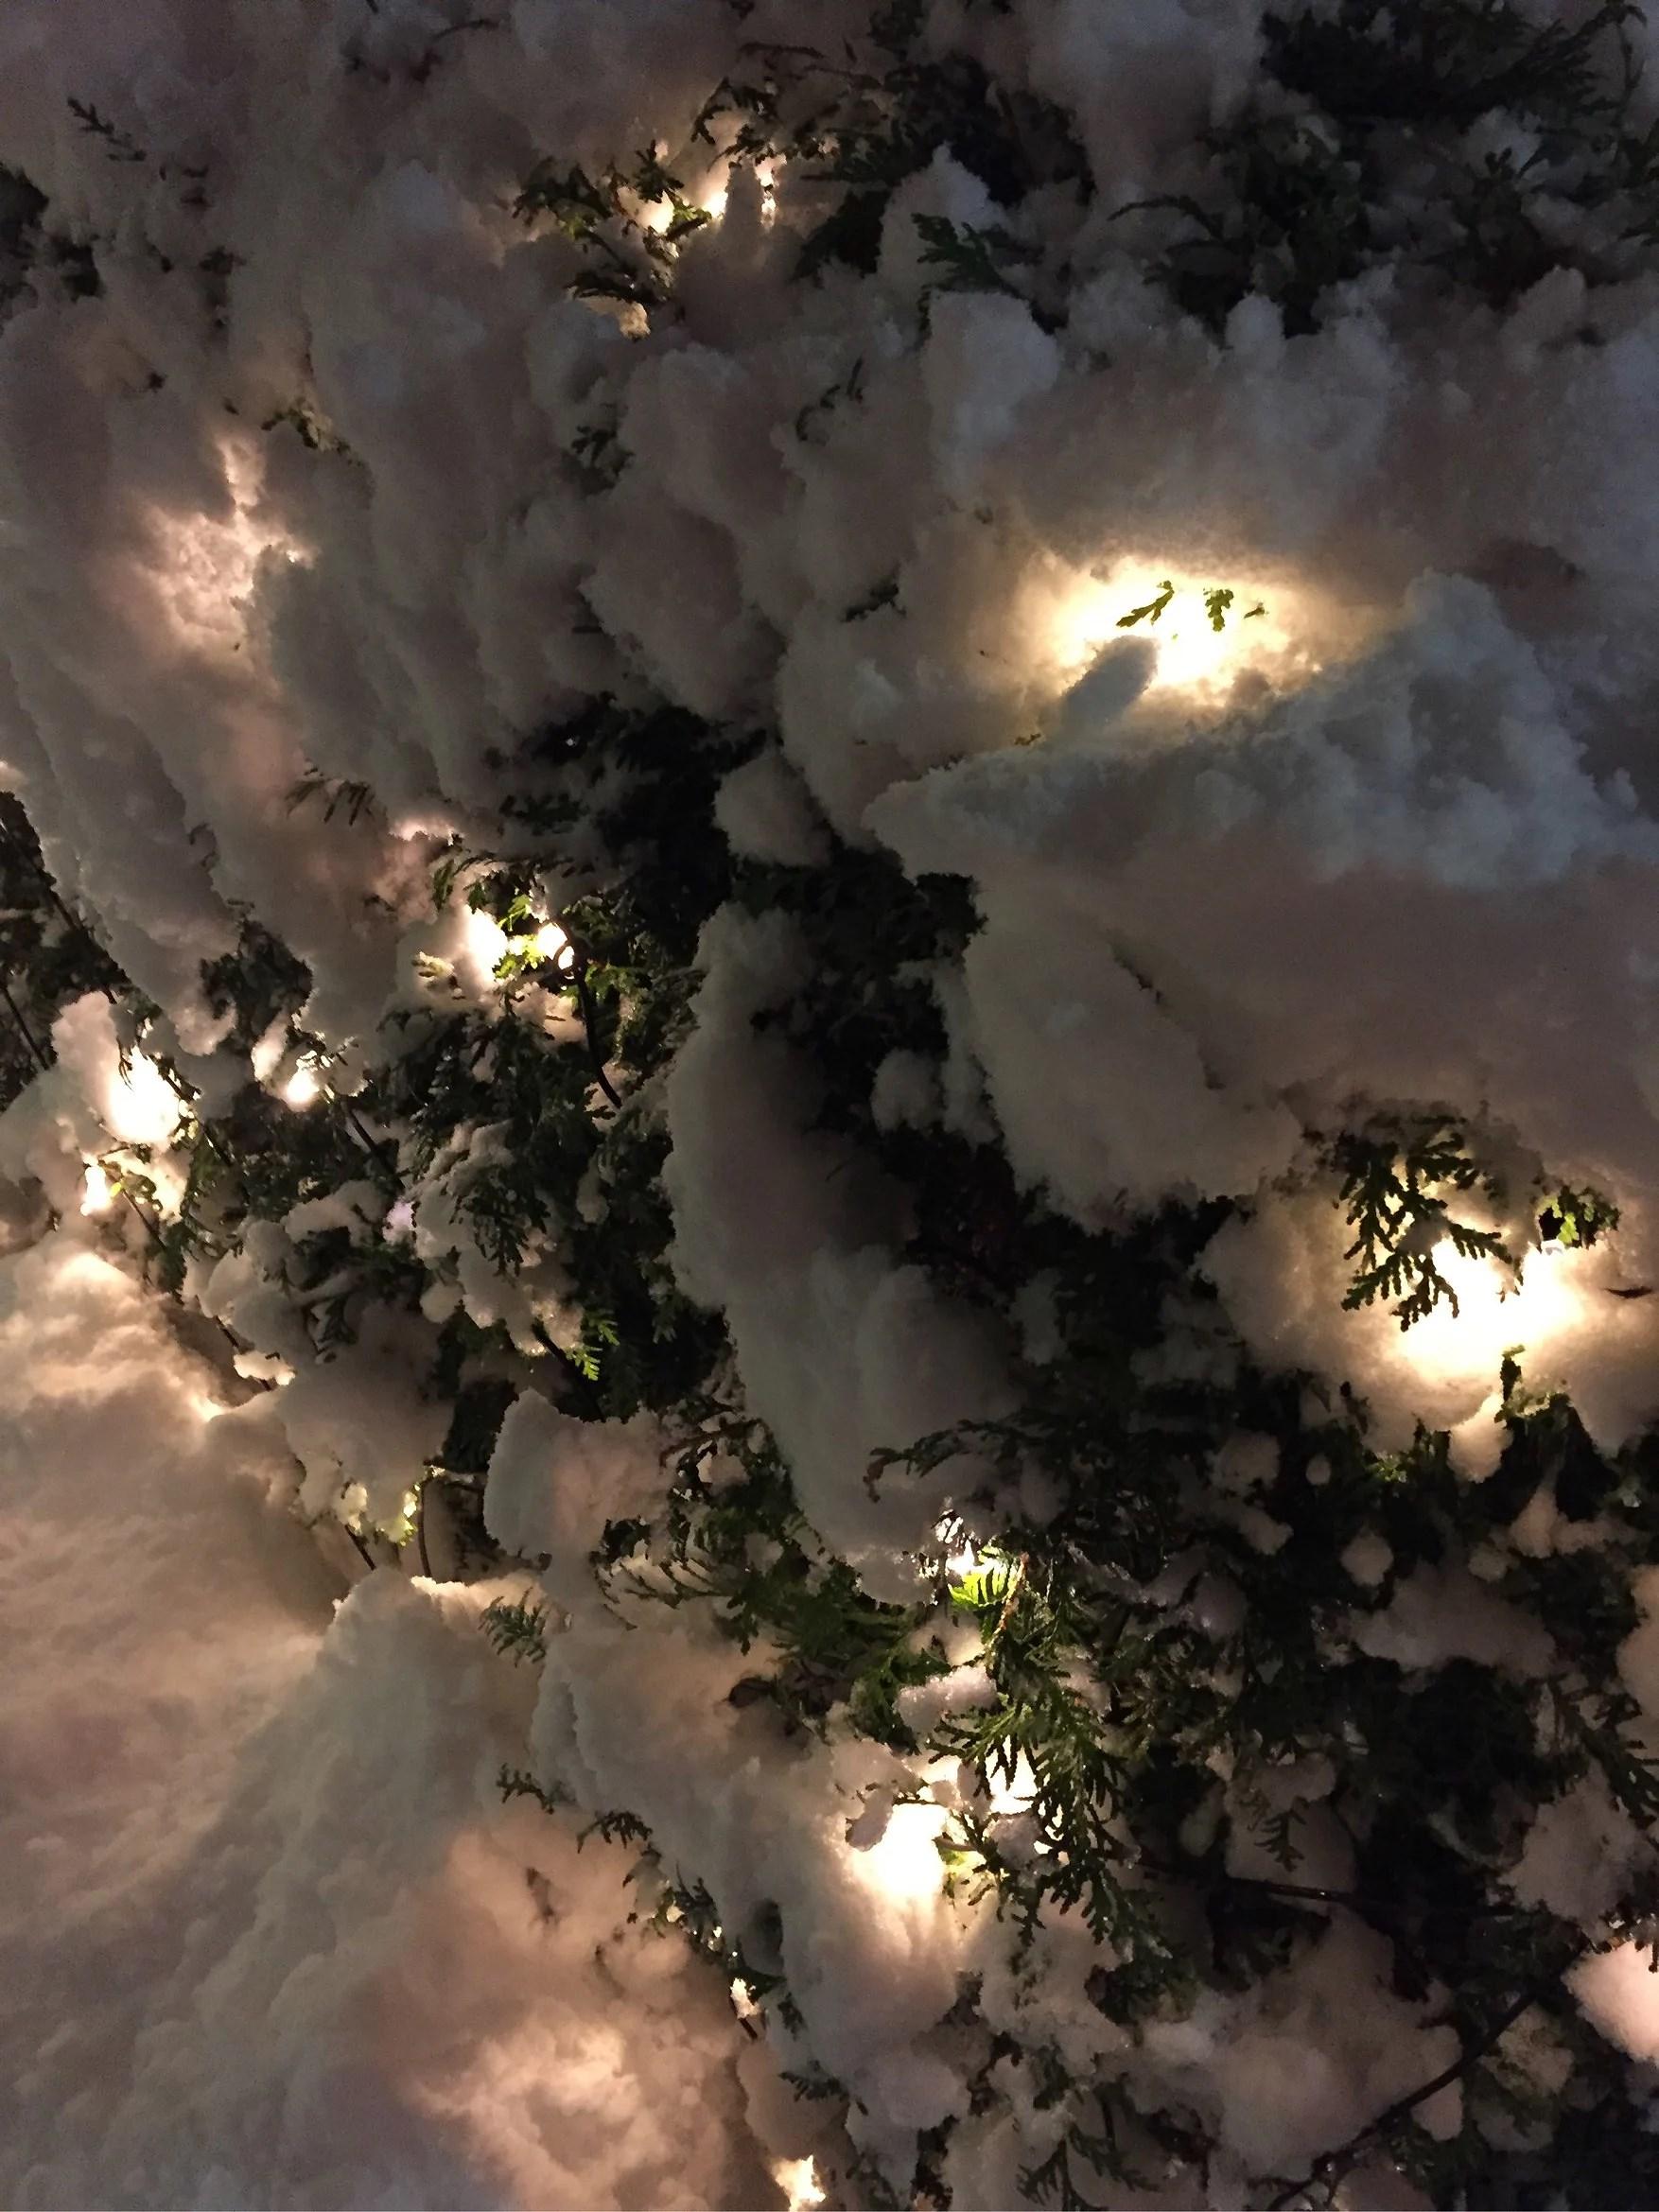 Snöpromenad